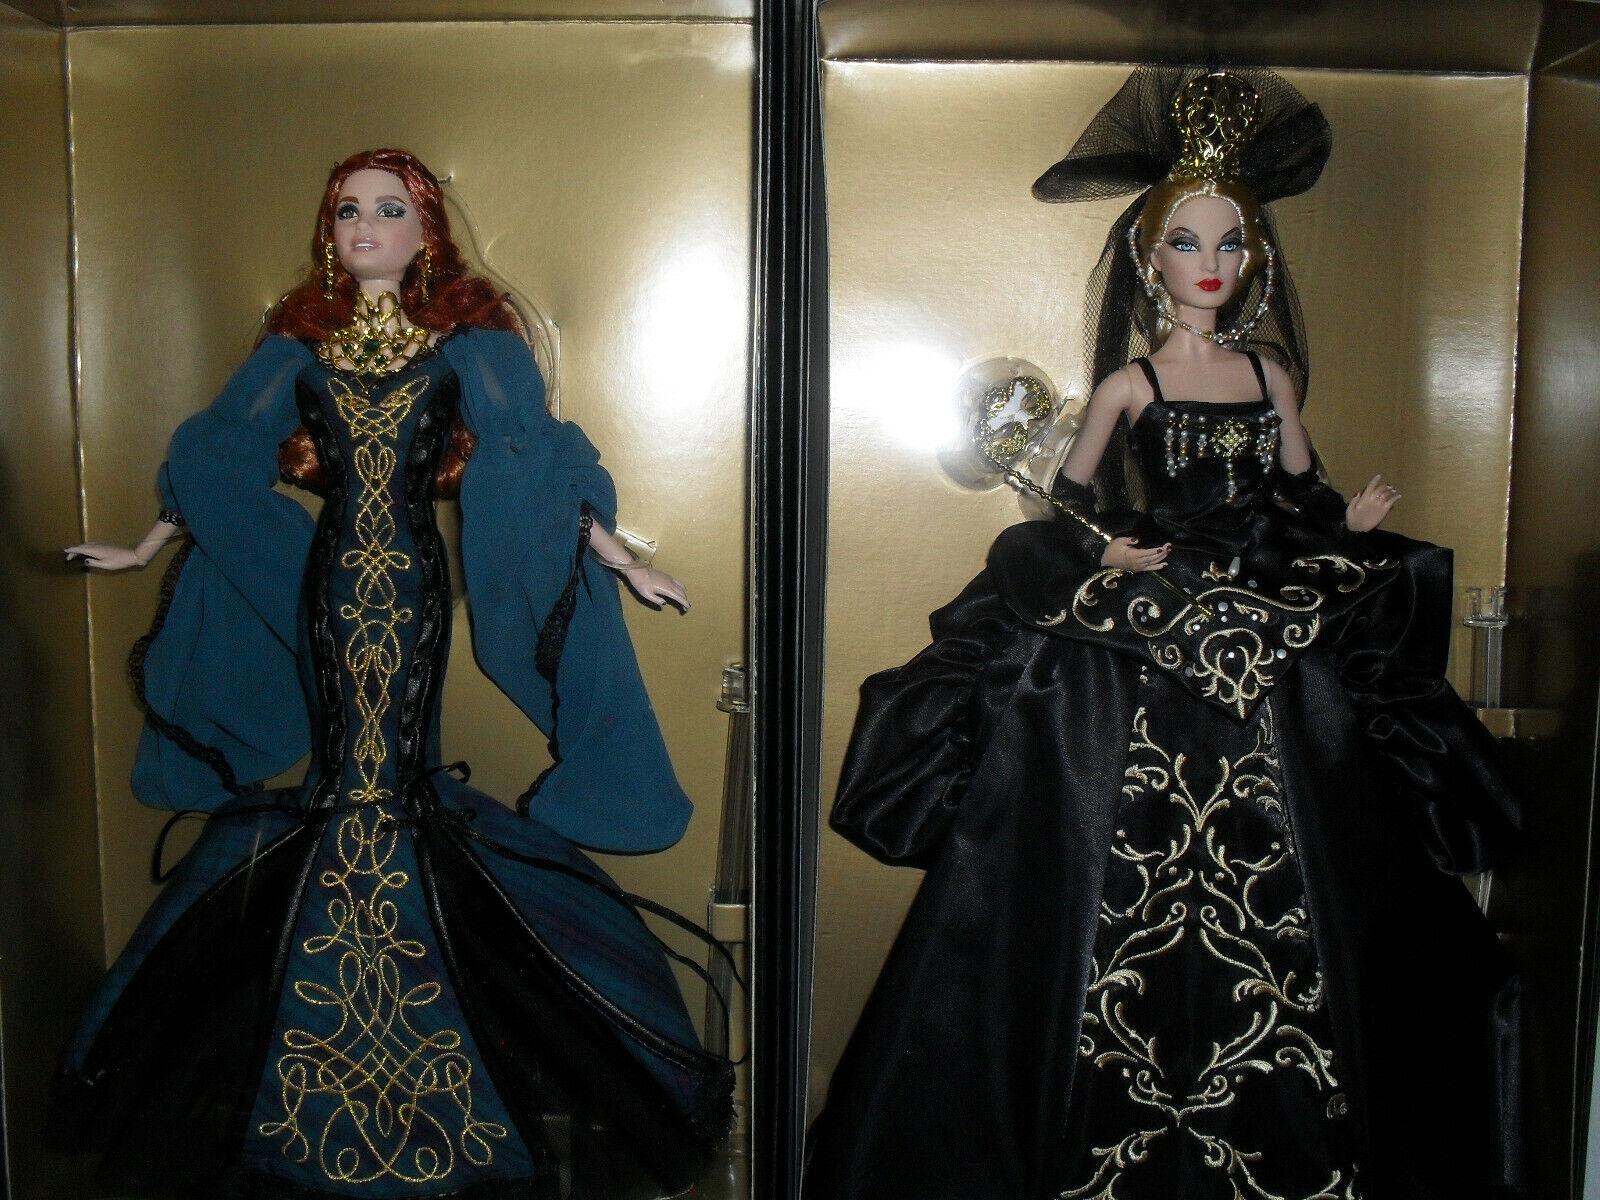 Global Glamour veneciano Muse y Sorcha Barbie oro Label